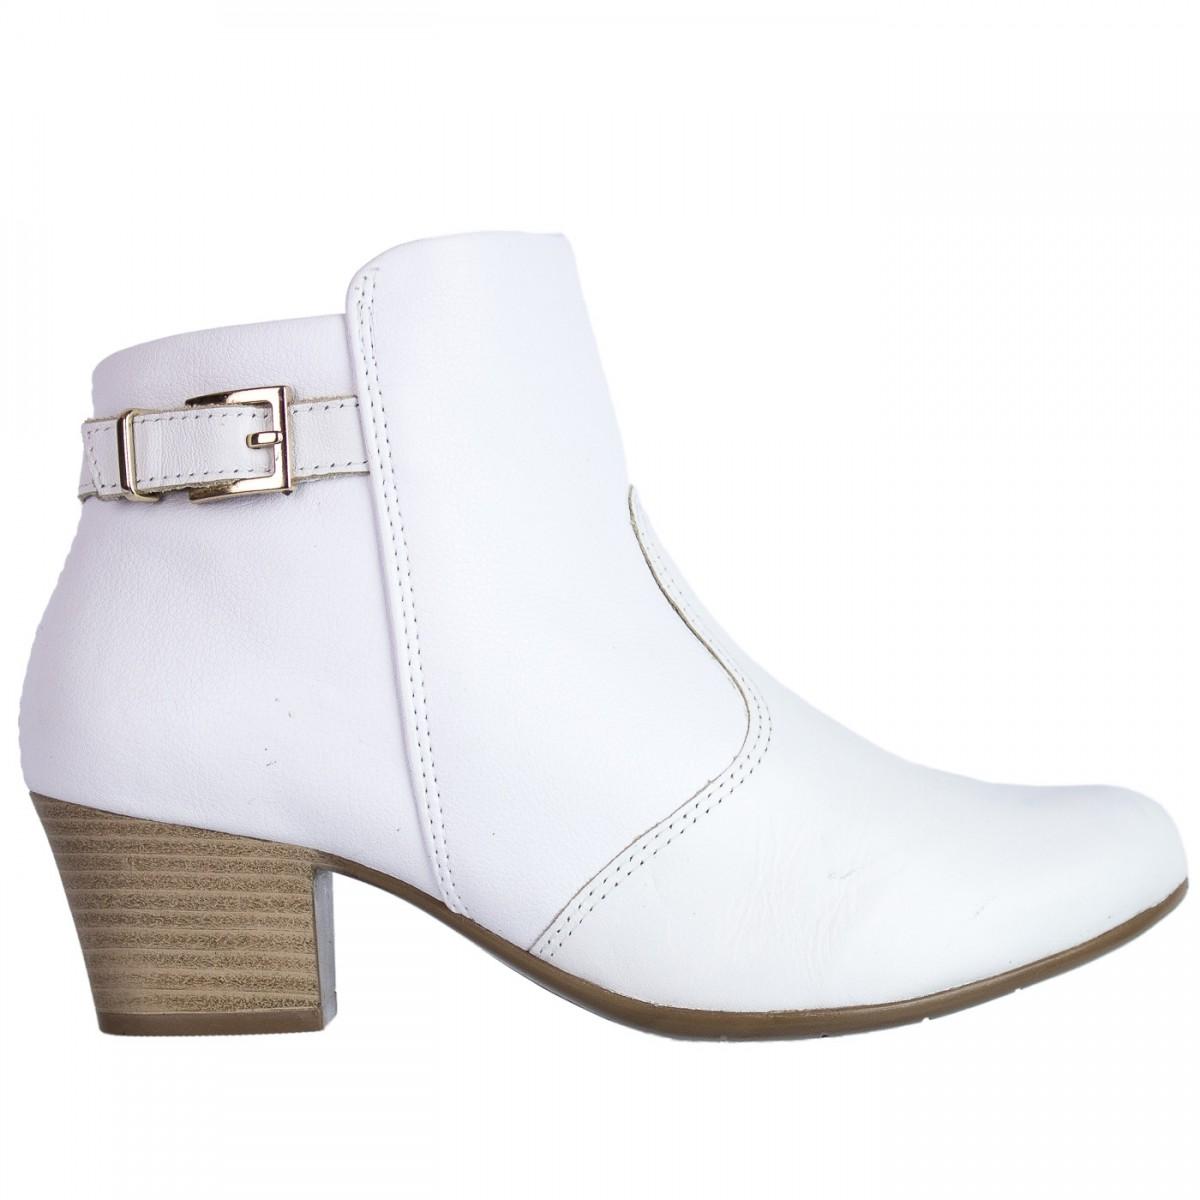 293923b9e Bizz Store - Bota Feminina Branca Comfortflex Cano Curto Couro